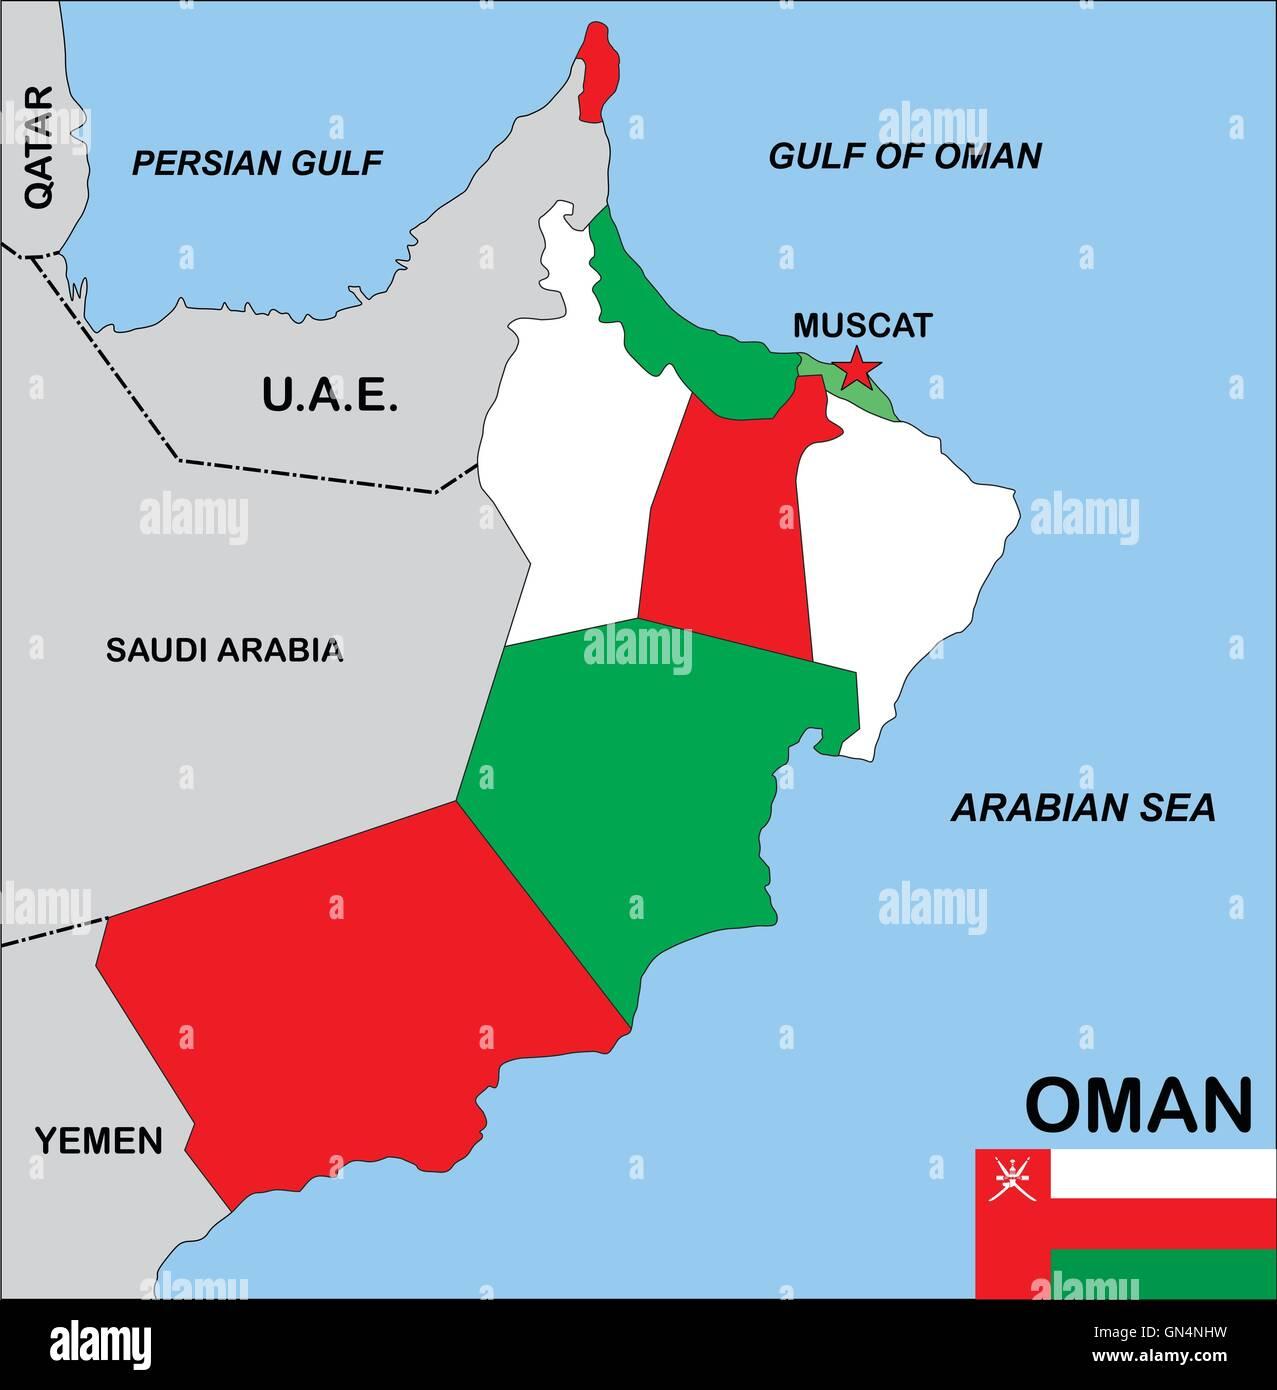 Karte Oman.Oman Karte Stockfoto Bild 116274757 Alamy